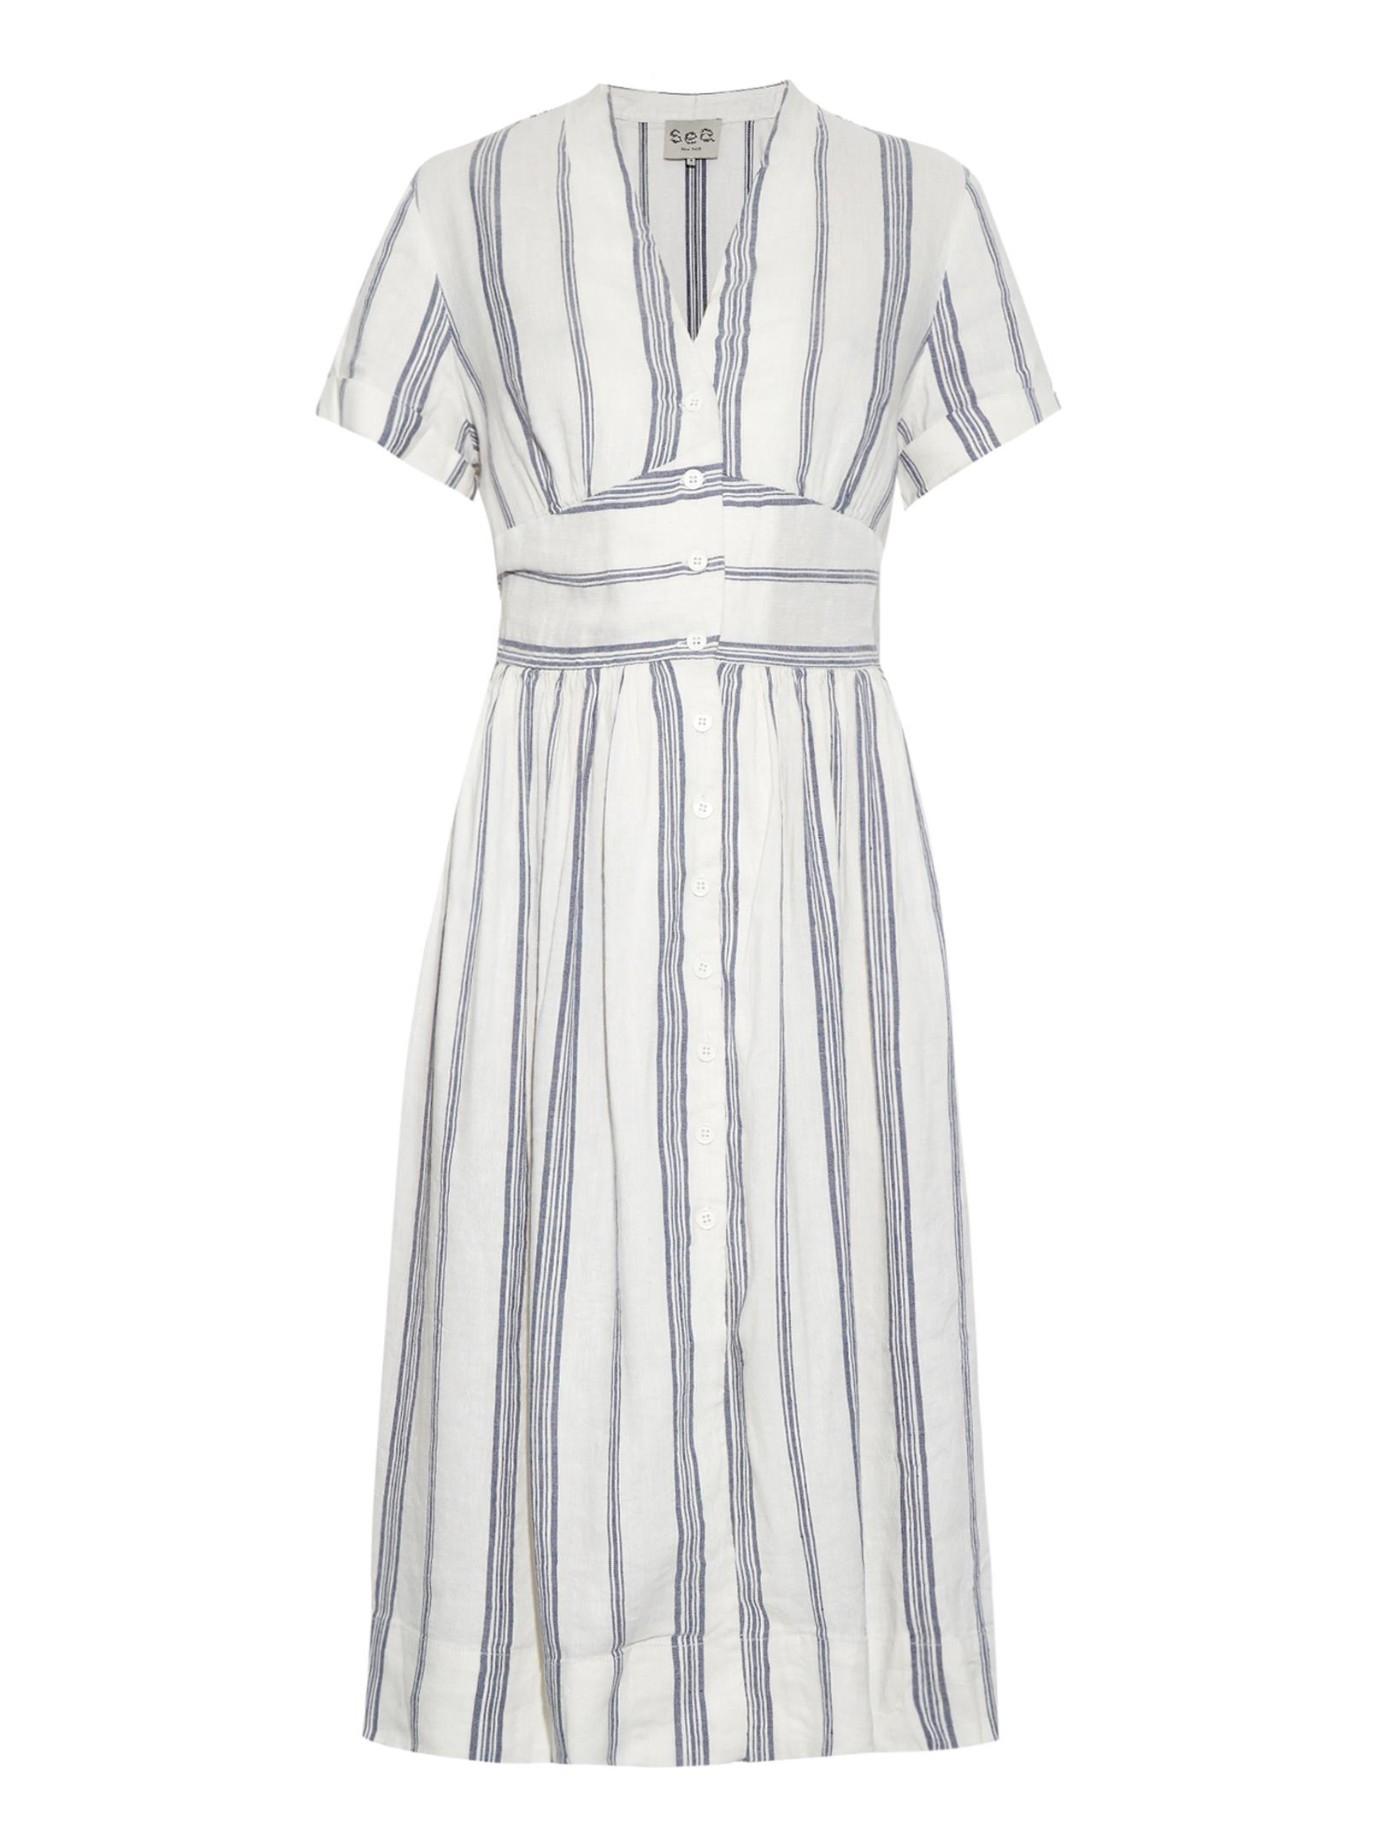 Lyst - Sea Striped Linen-Blend Dress